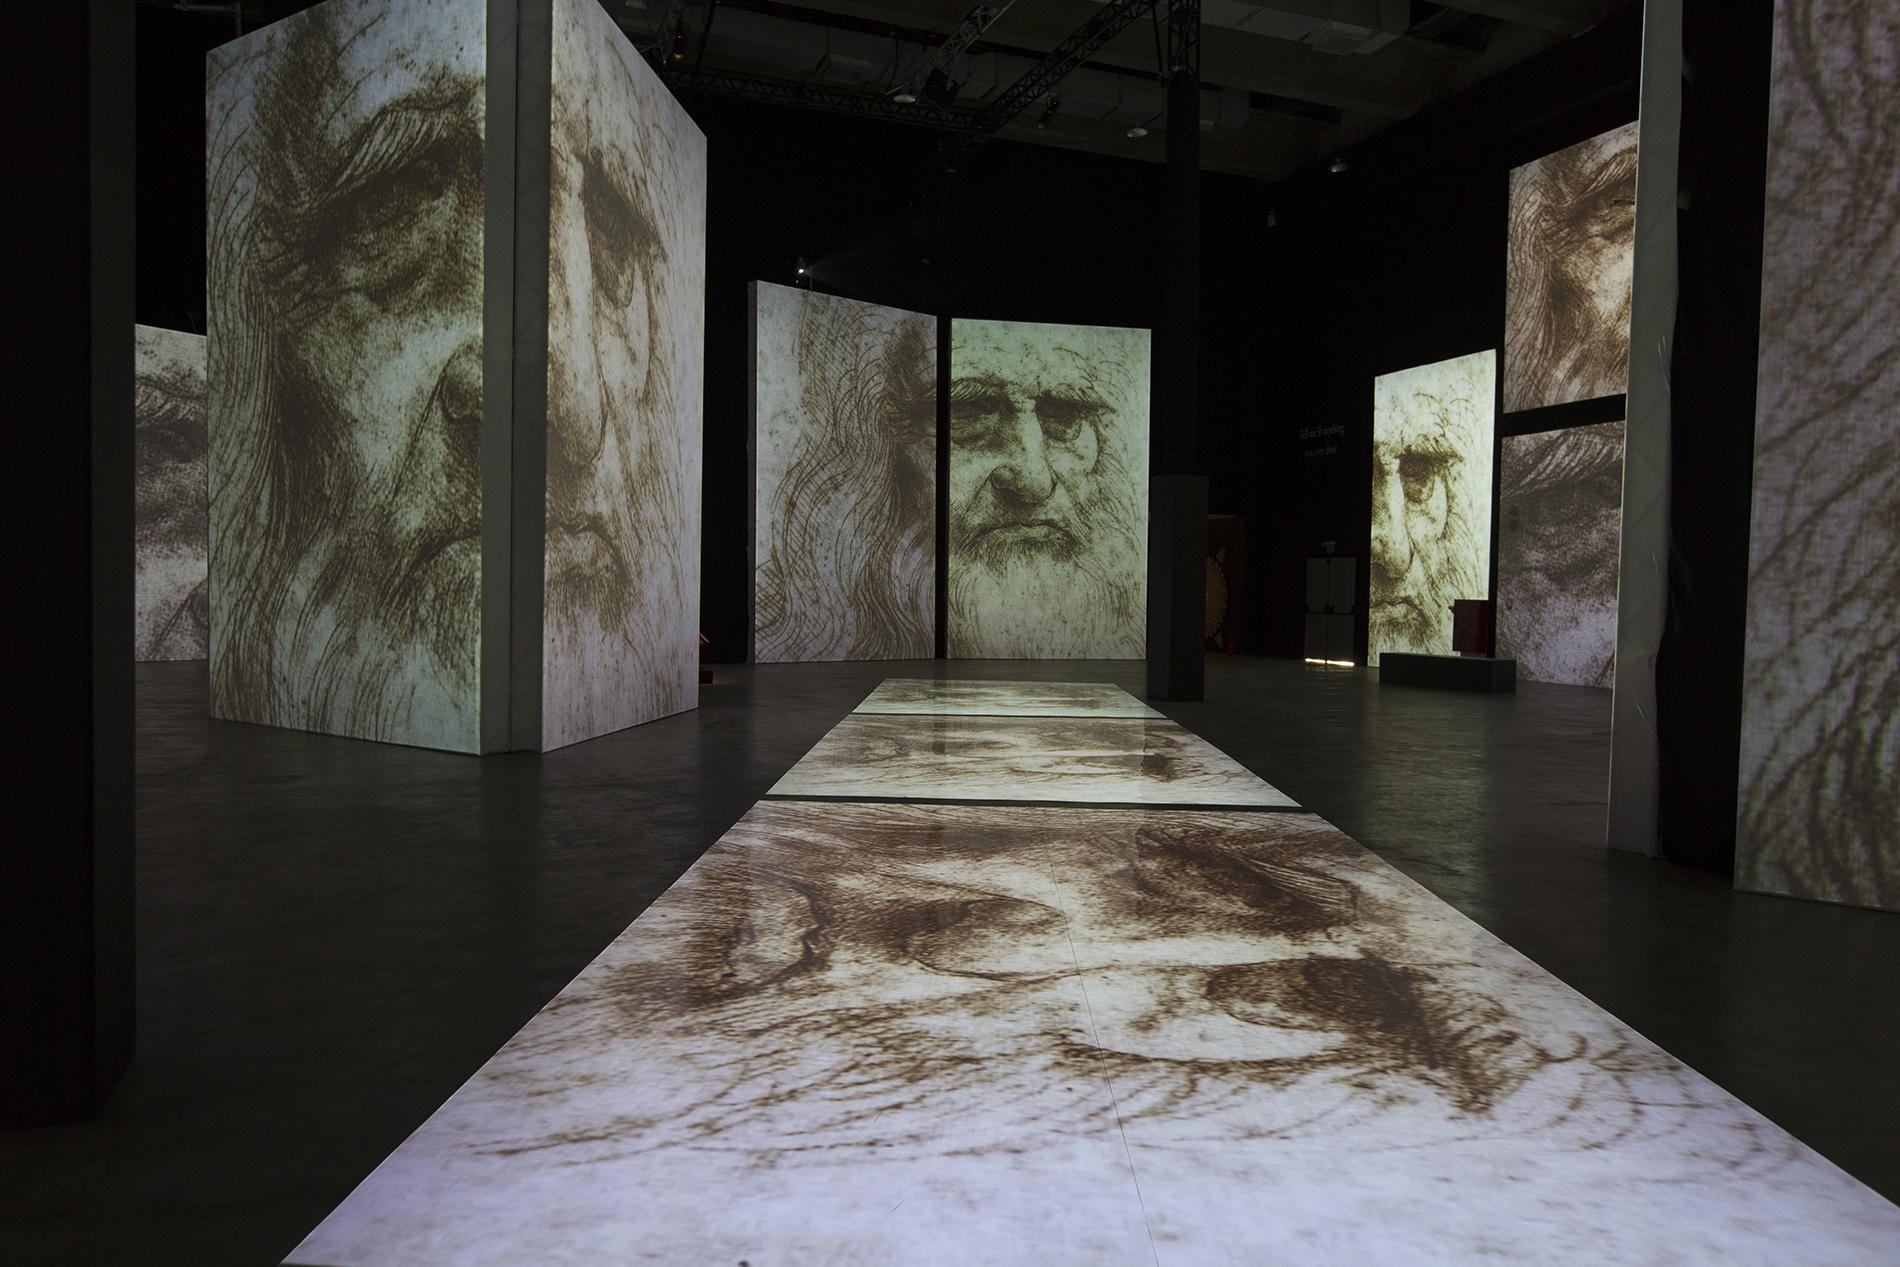 City Tour + Leonardo Da Vinci: 500 años de genialidad